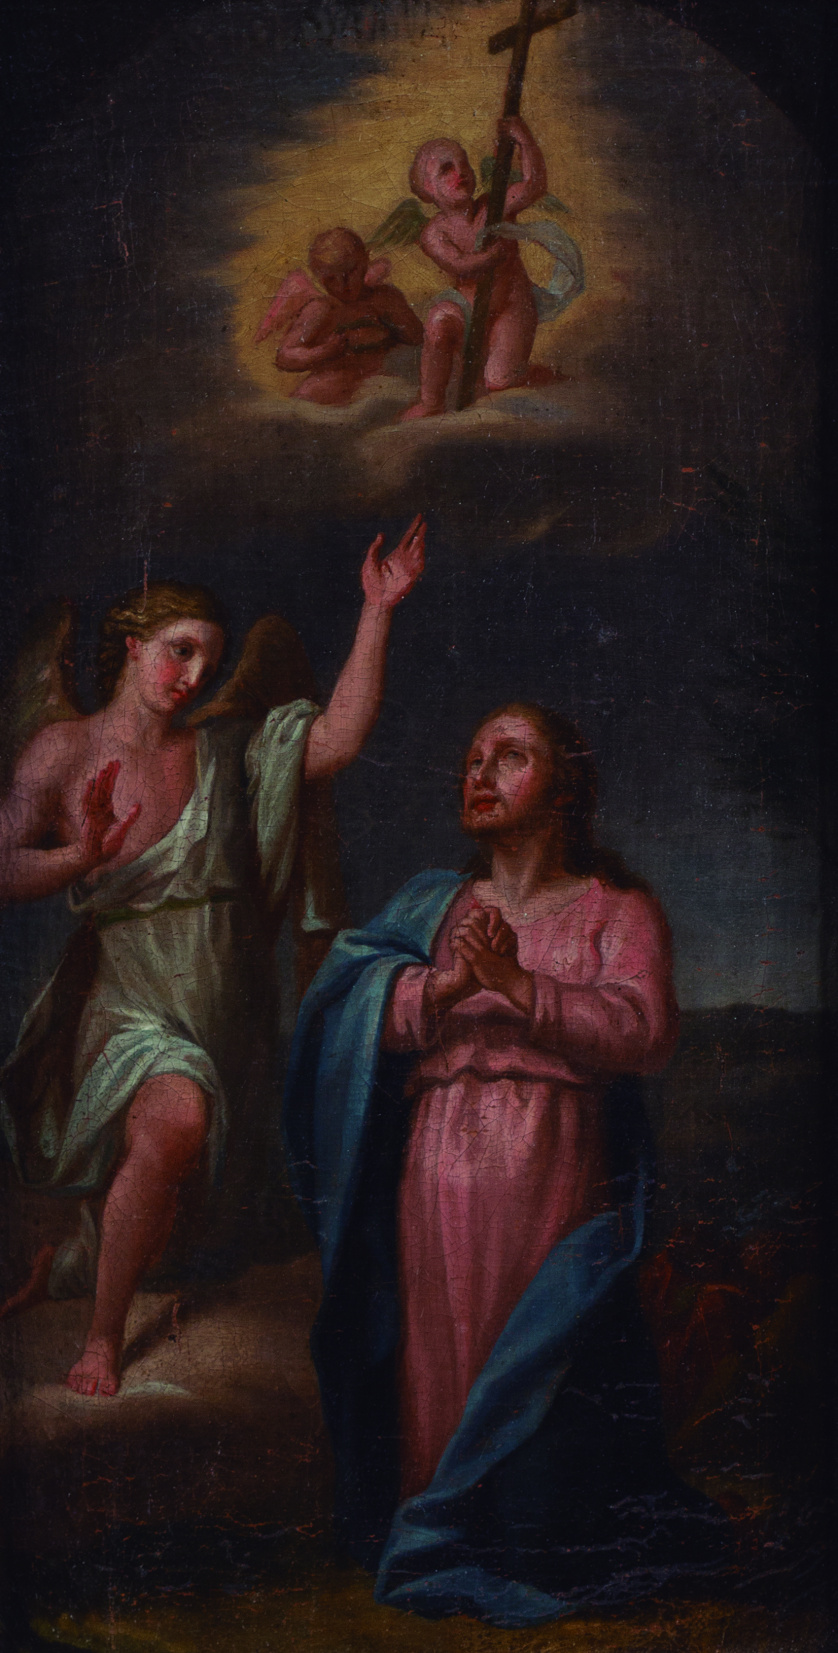 ESCUELA ESPAÑOLA, SIGLO XVIII, ESCUELA ESPAÑOLA, SIGLO XVII